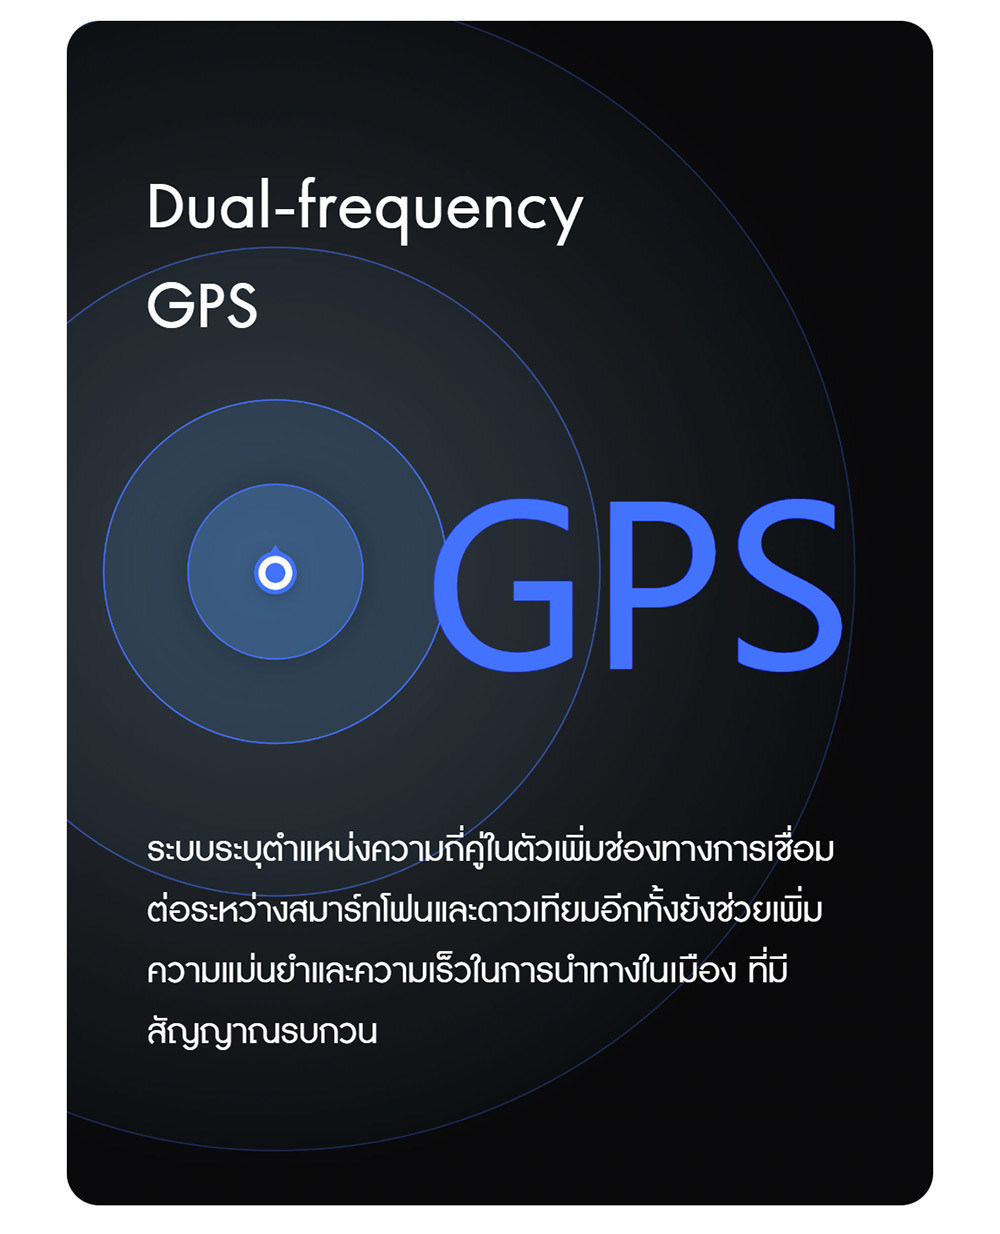 03-3000086087-feature-3.jpg